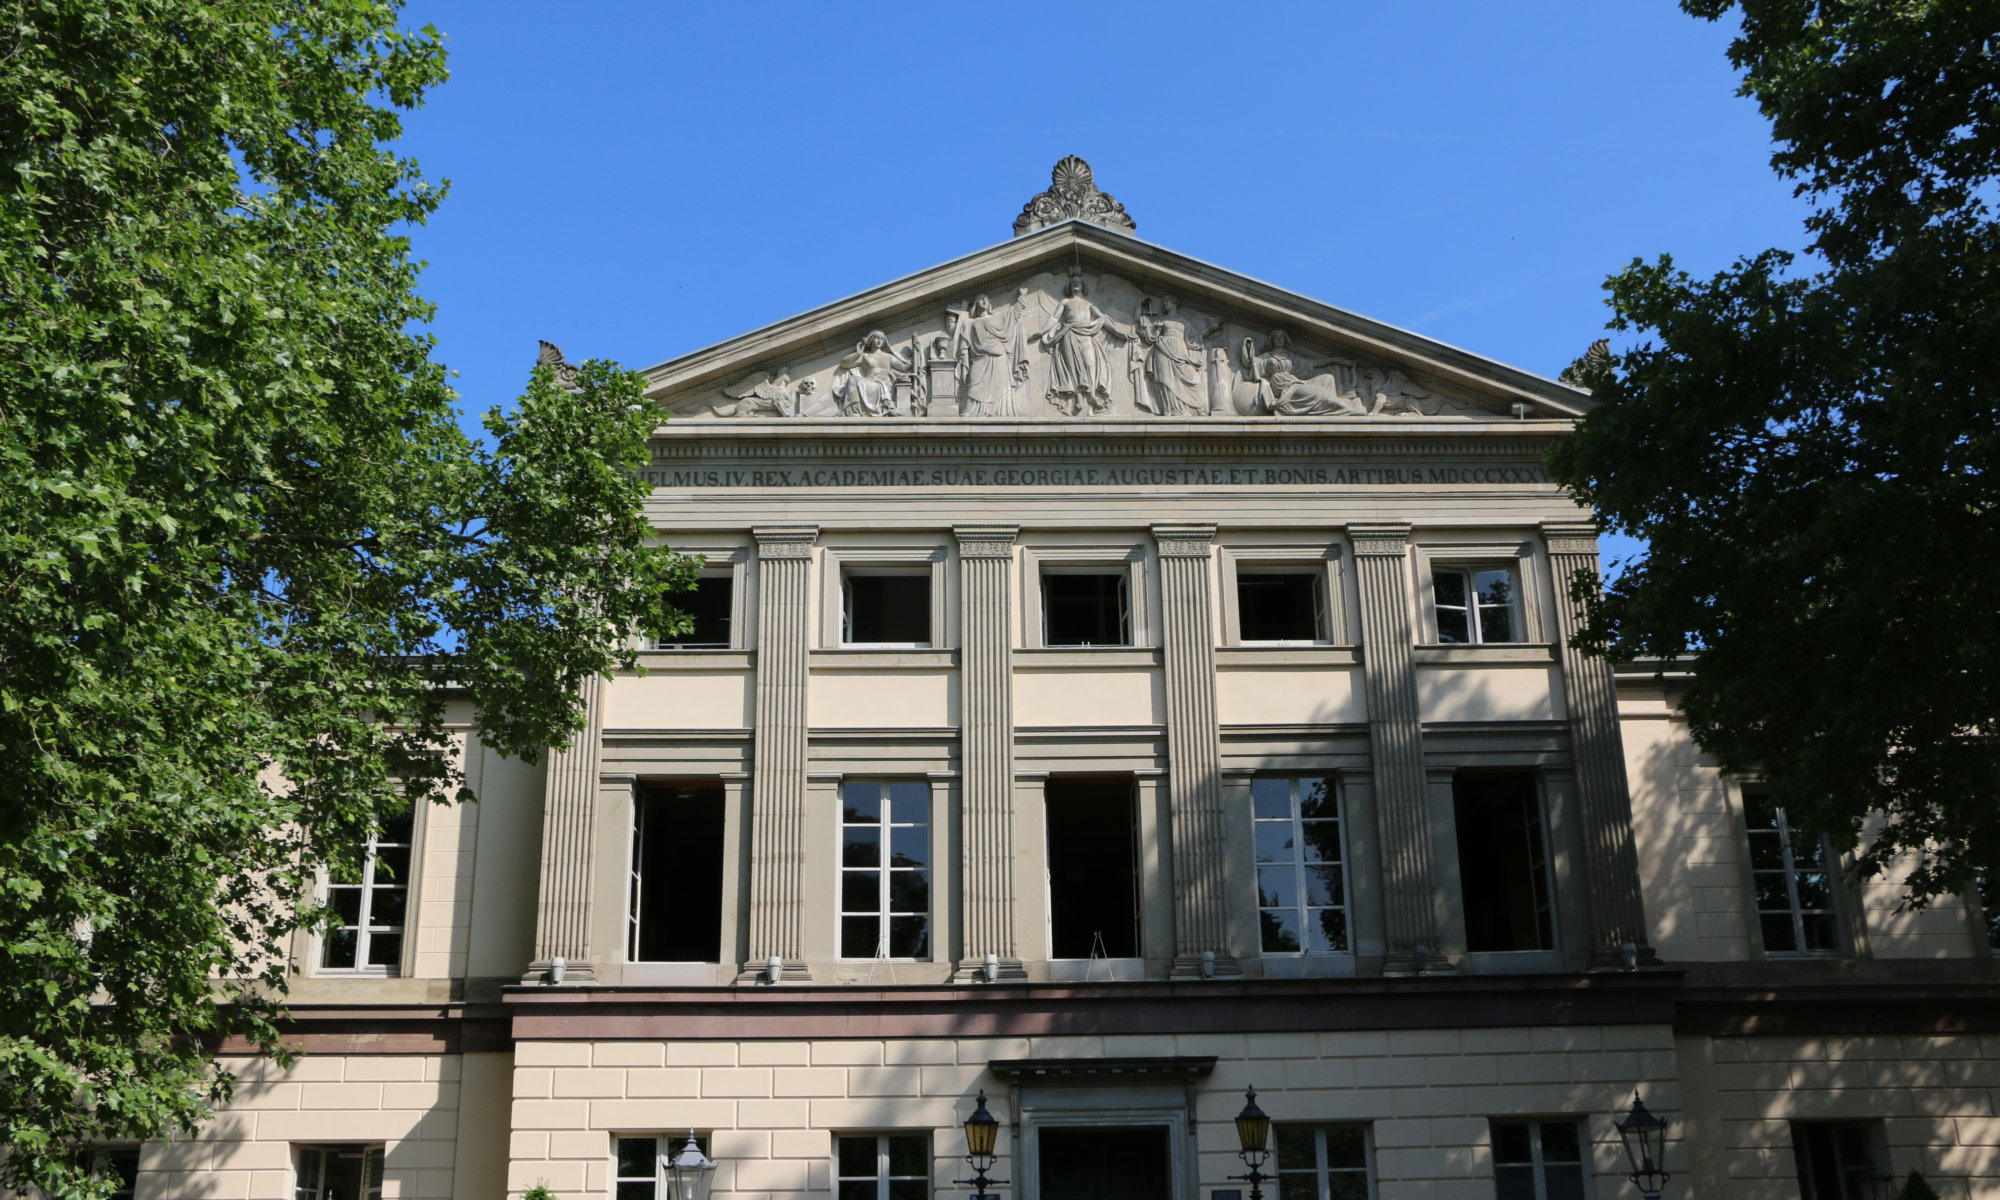 Aula am Wilhelmsplatz, Göttingen